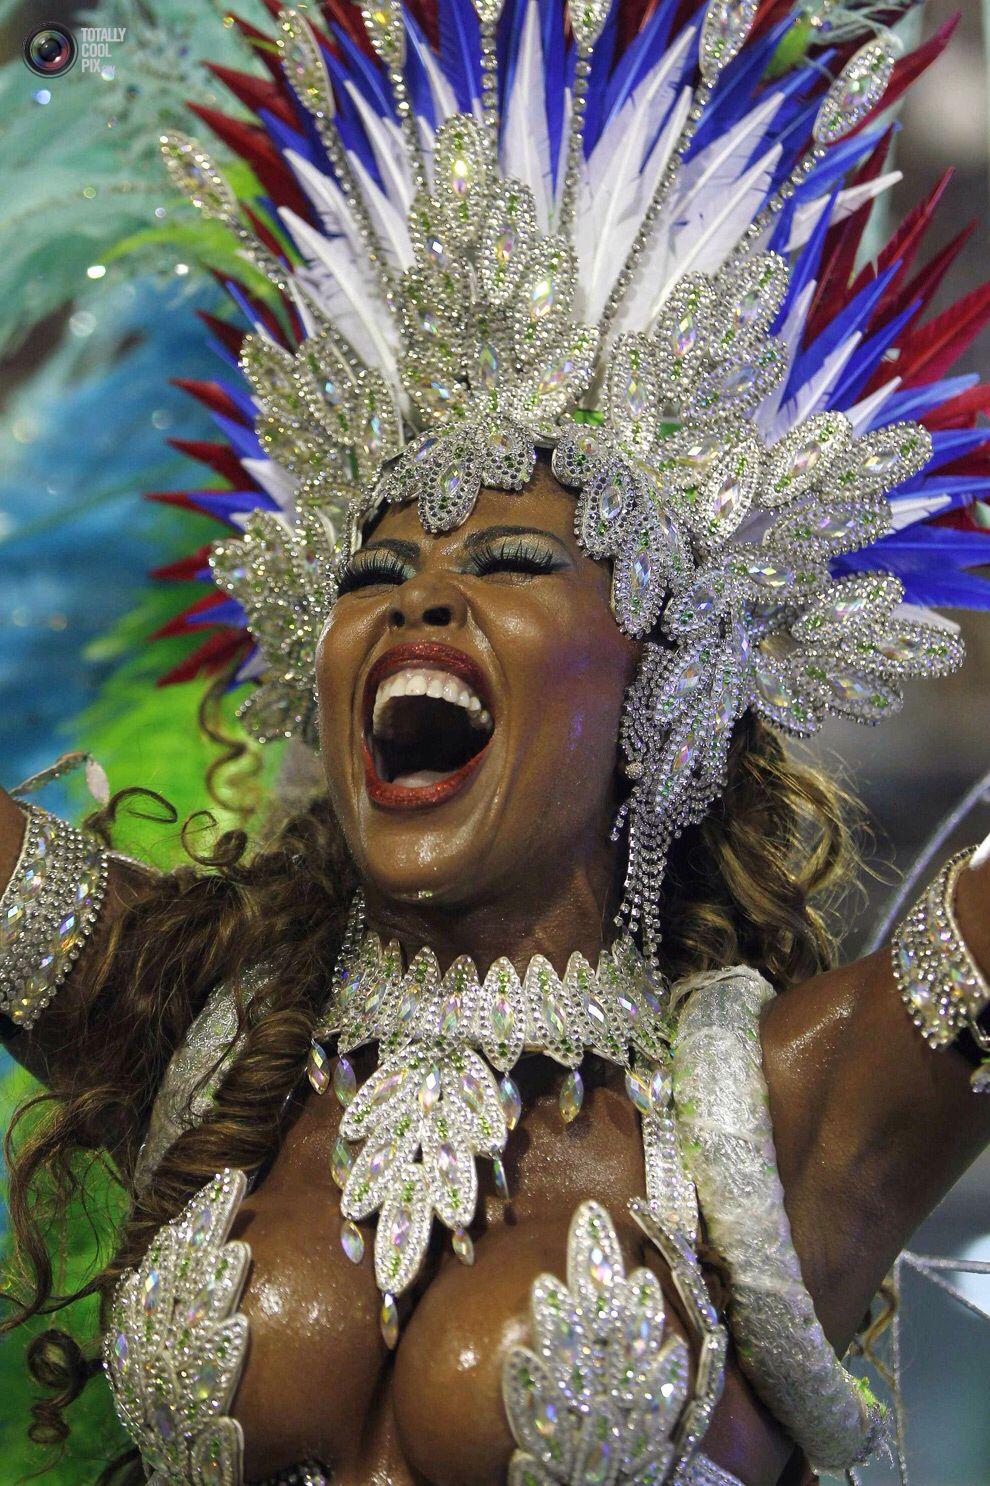 Carnaval de Rio en 2019 Costume de carnaval, Costume